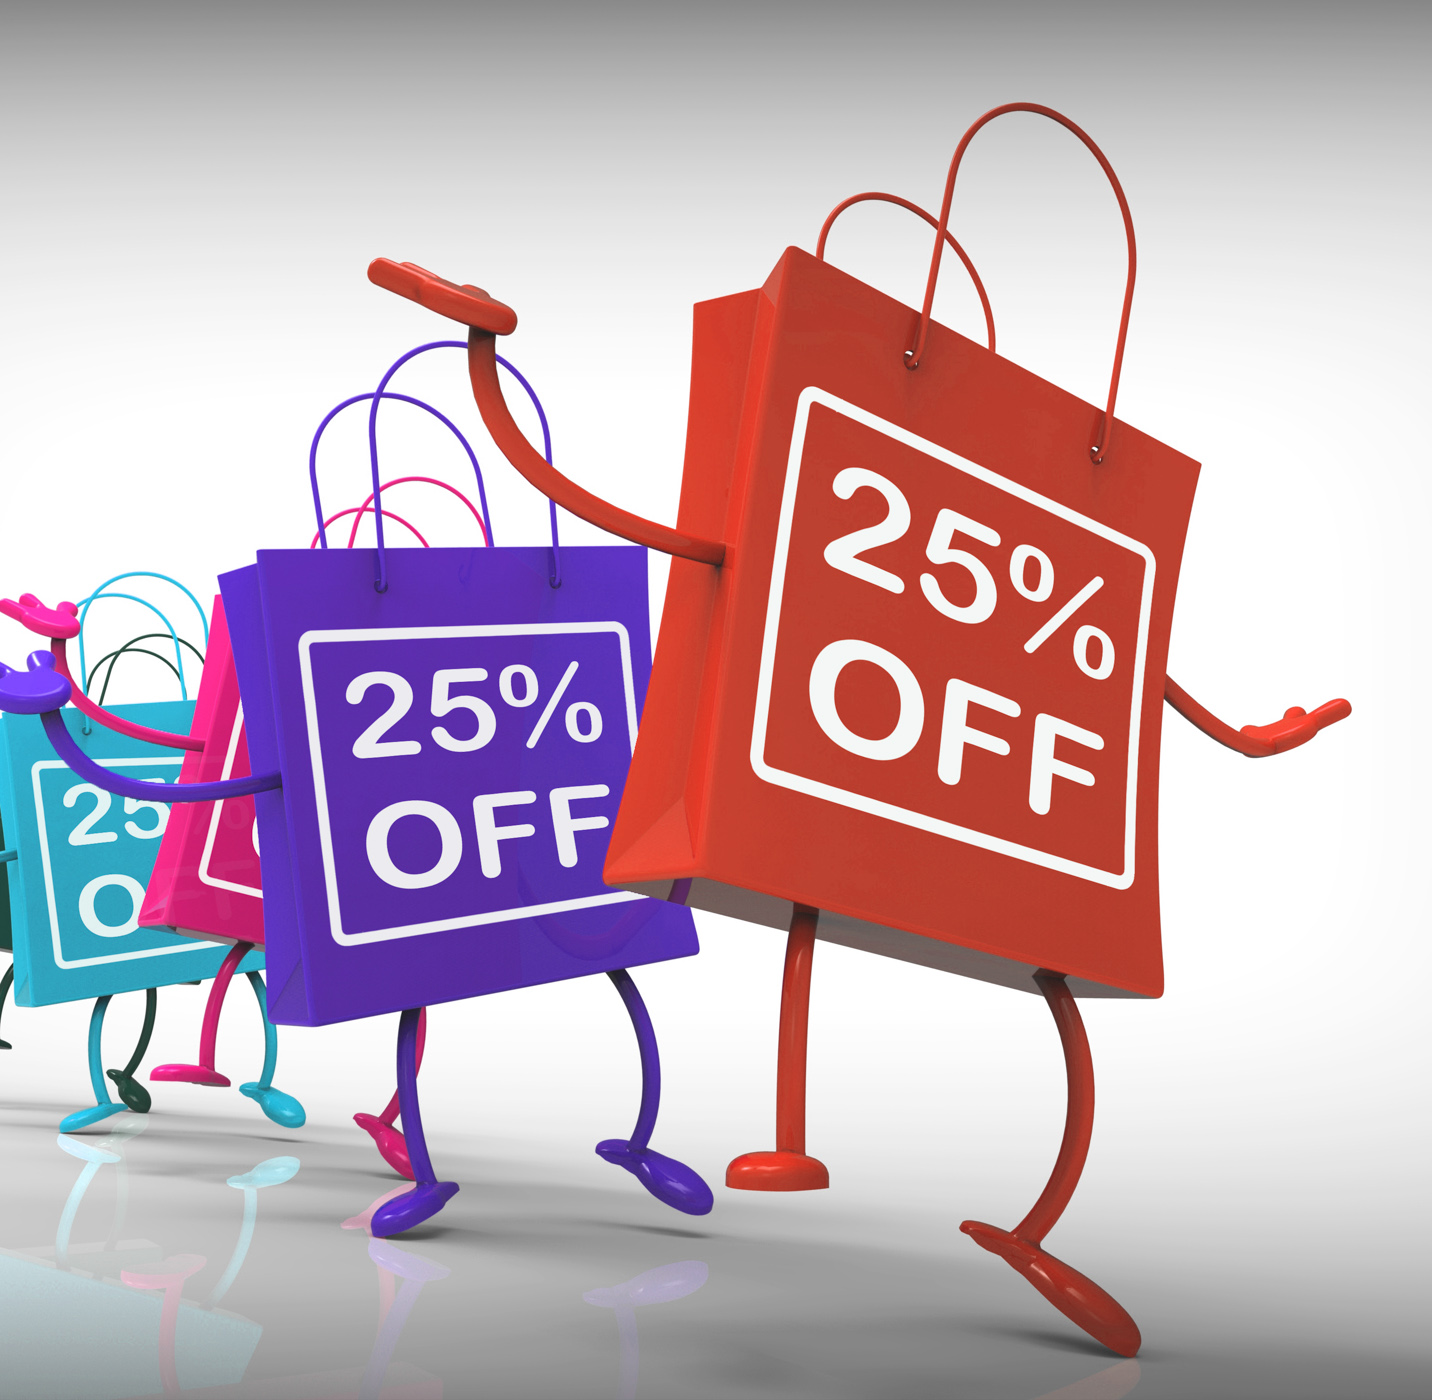 Twenty-five percent off bags show 25 sales photo